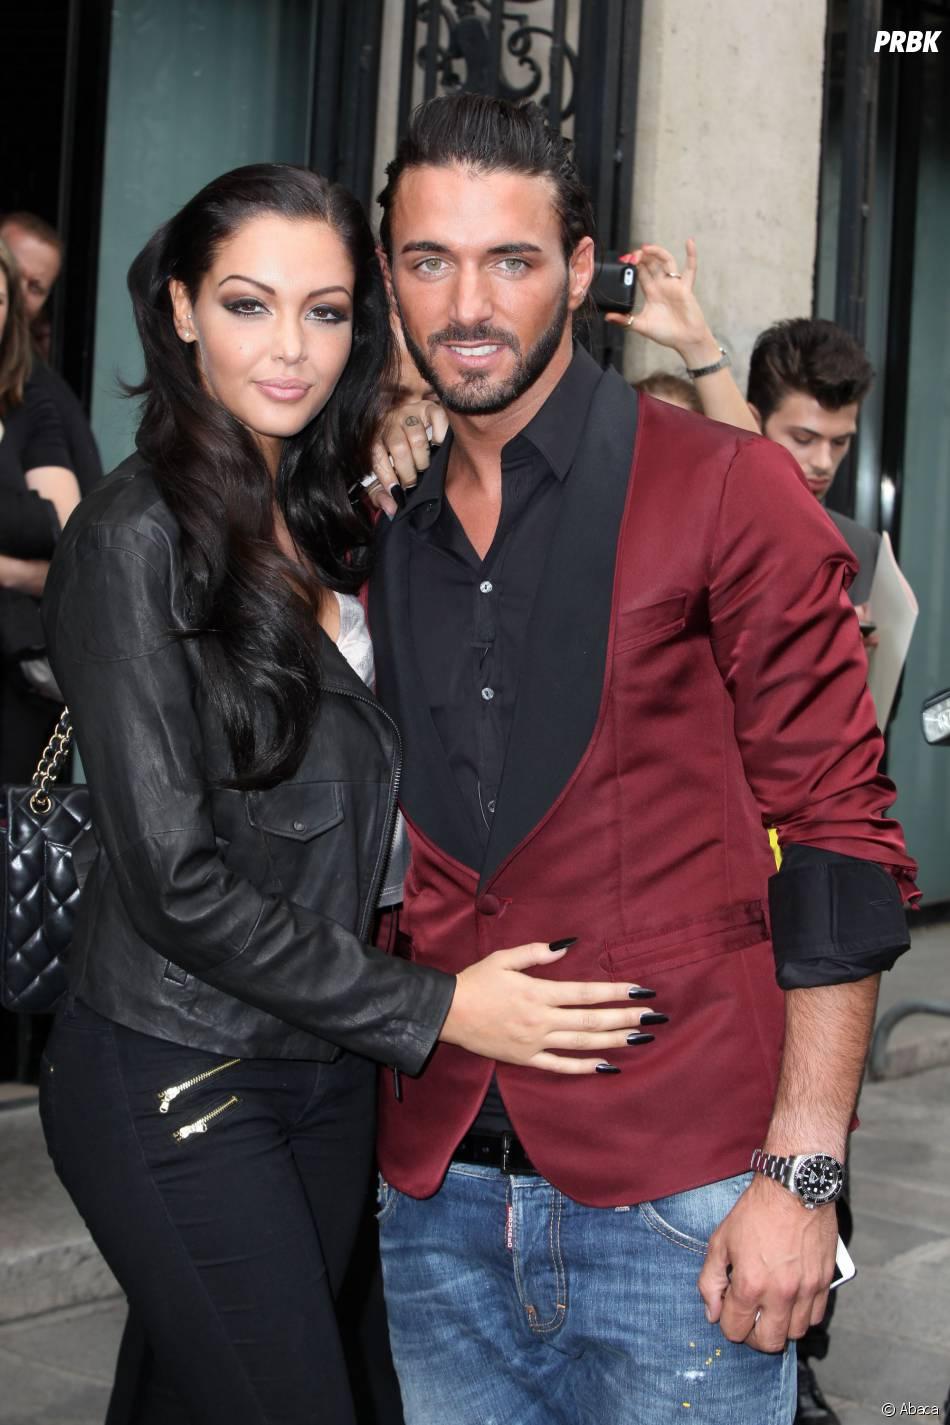 Nabilla Benattia et Thomas Vergara : une grosse embrouille avant les fiançailles ?